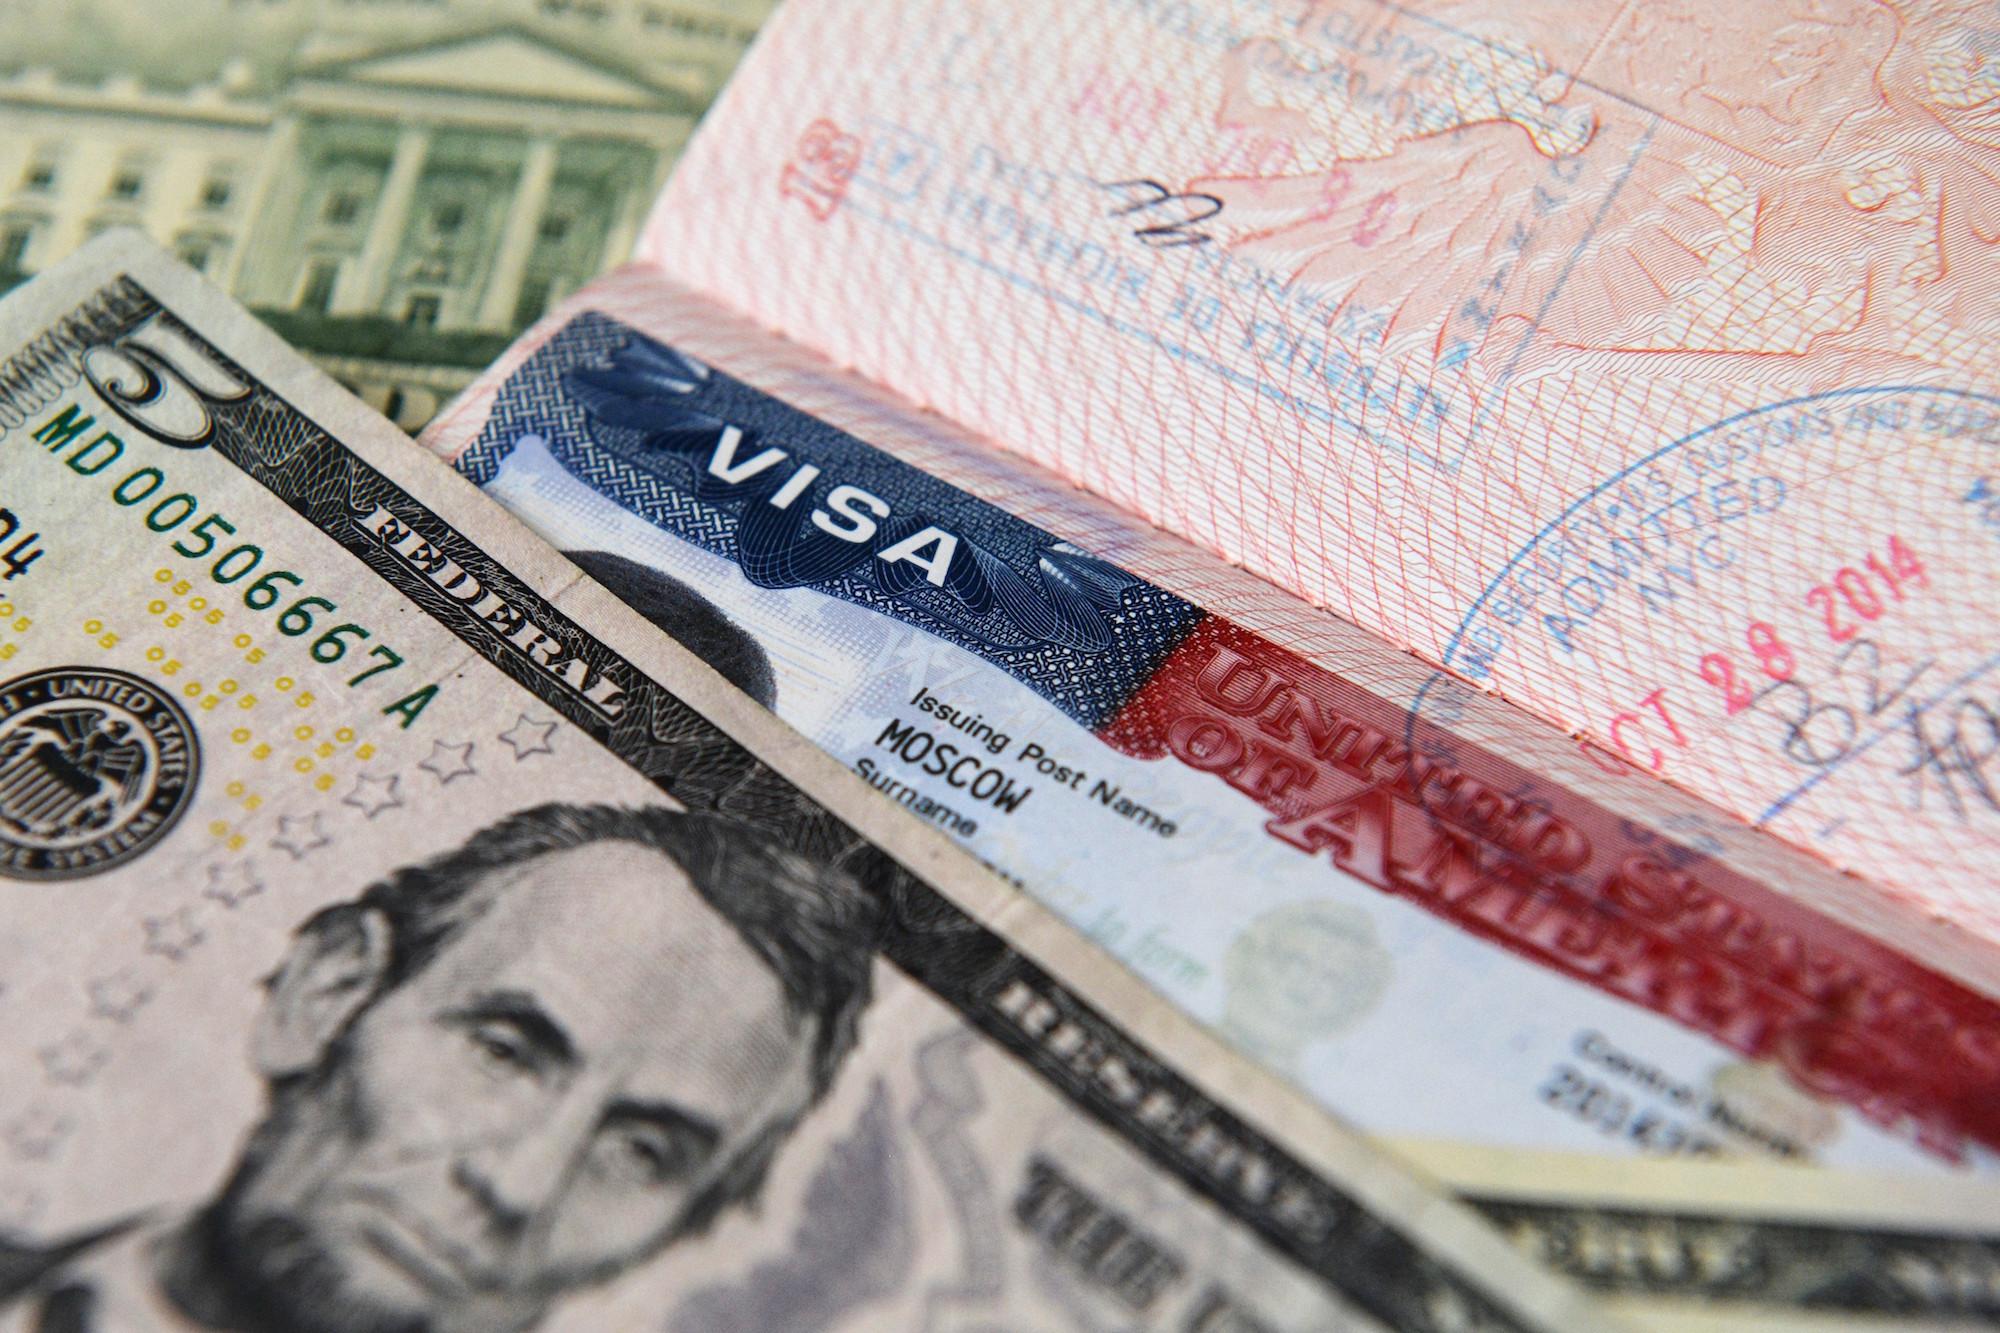 Доллары США в загранпаспорте